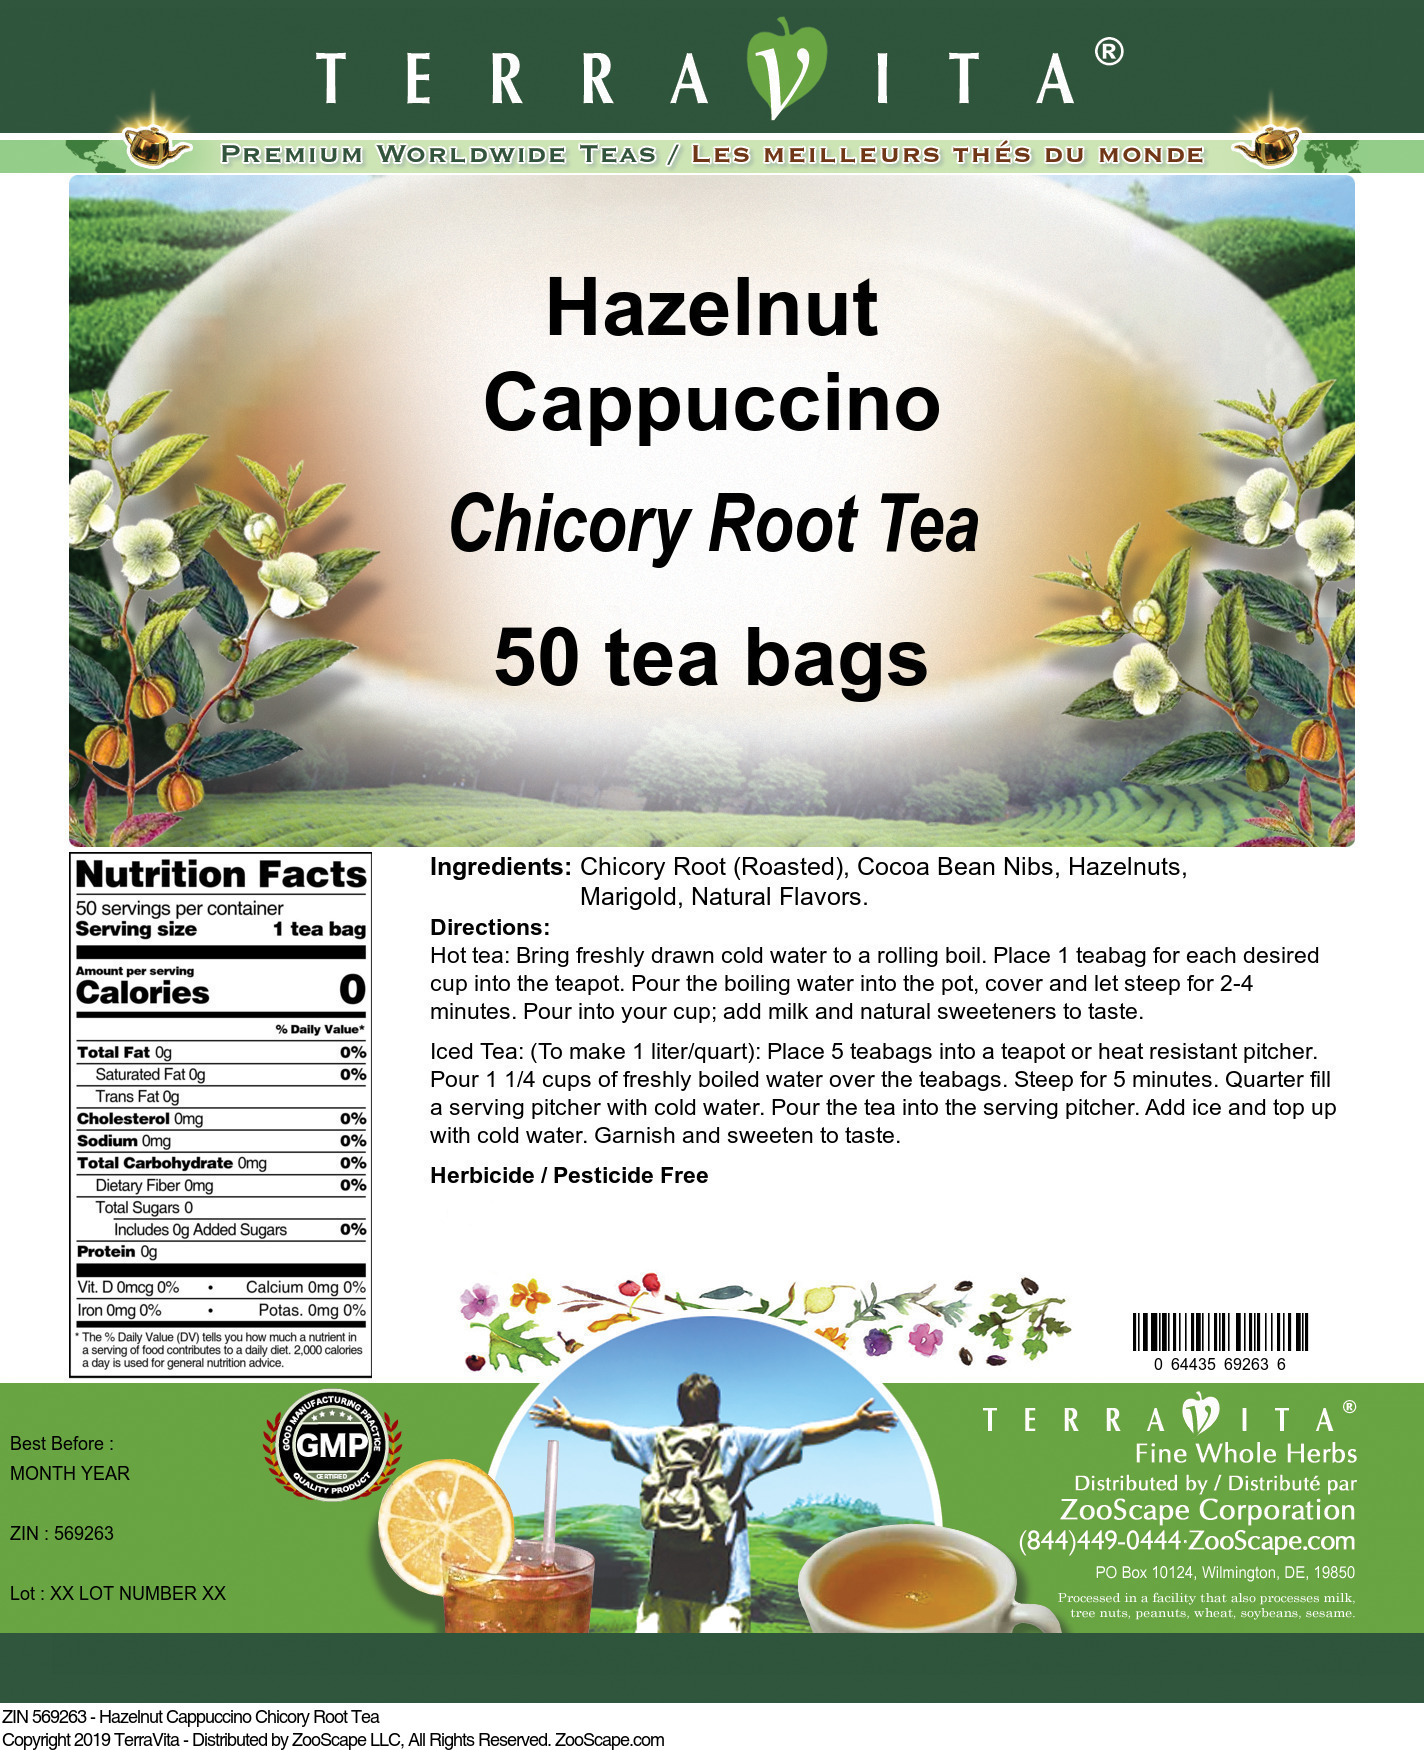 Hazelnut Cappuccino Chicory Root Tea